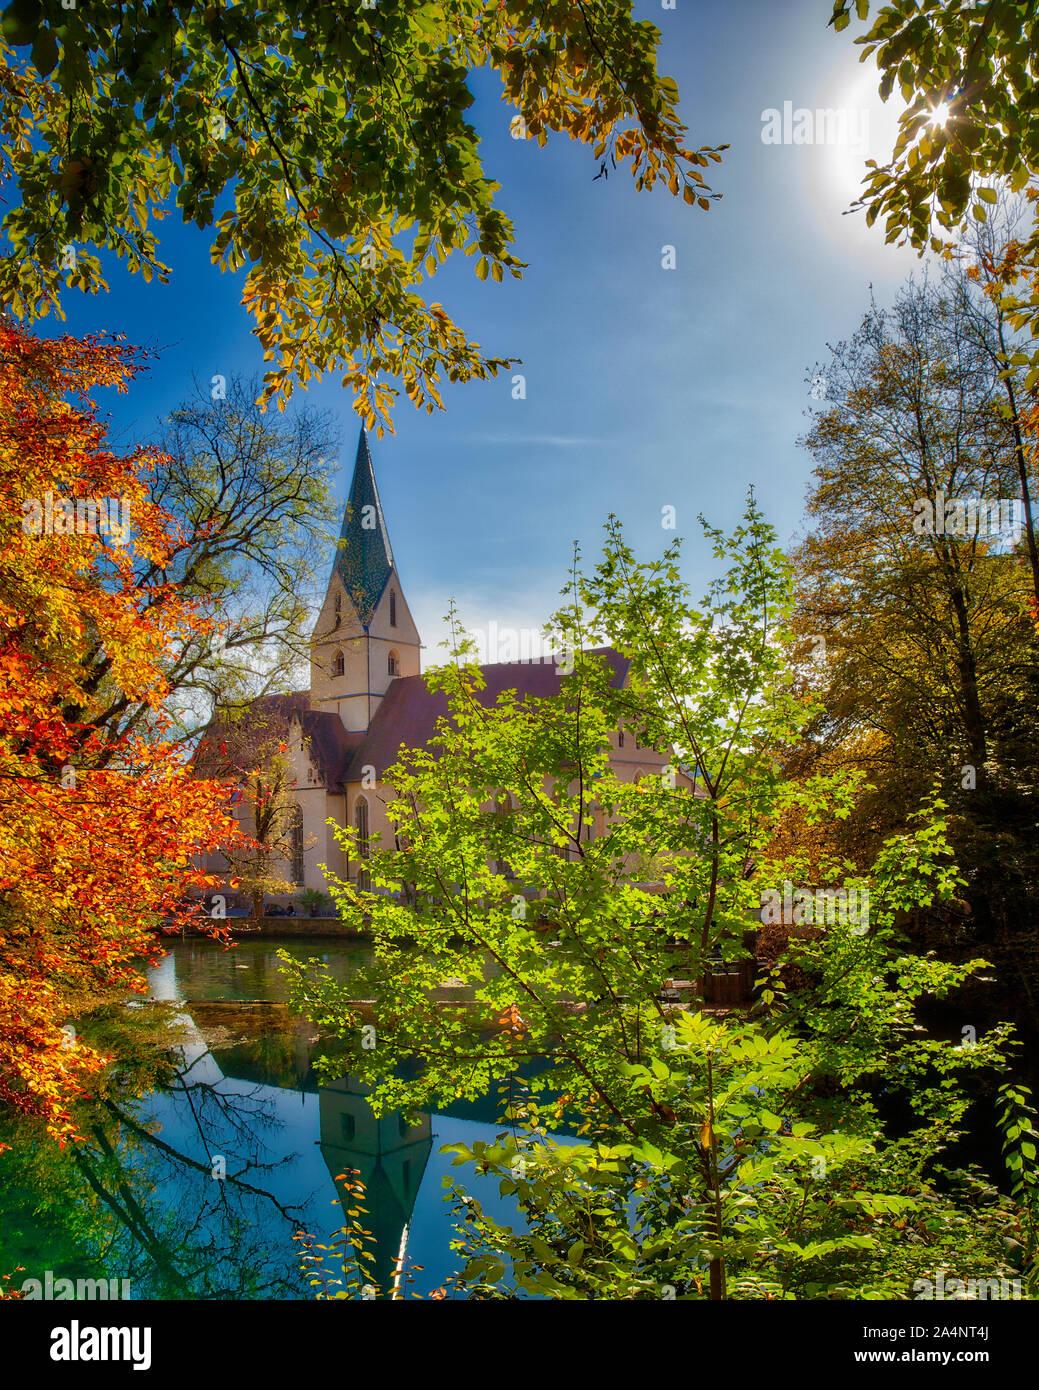 DE - BADEN-WÜRTTEMBERG: The Blautopf and Blaubeuren Abbey  (A UNESCO World Heritage Site) Stock Photo